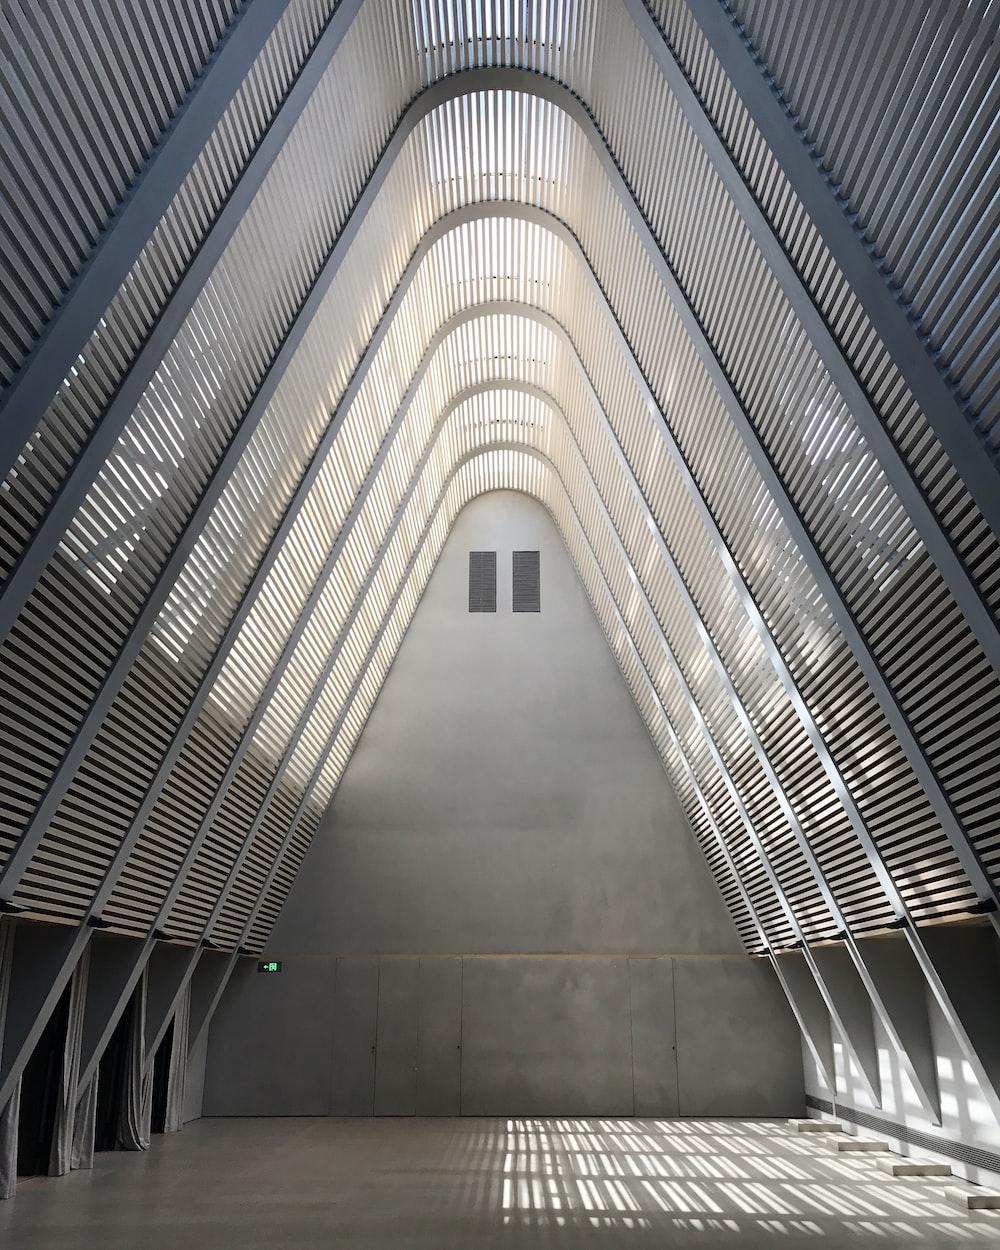 landscape photo of building interior